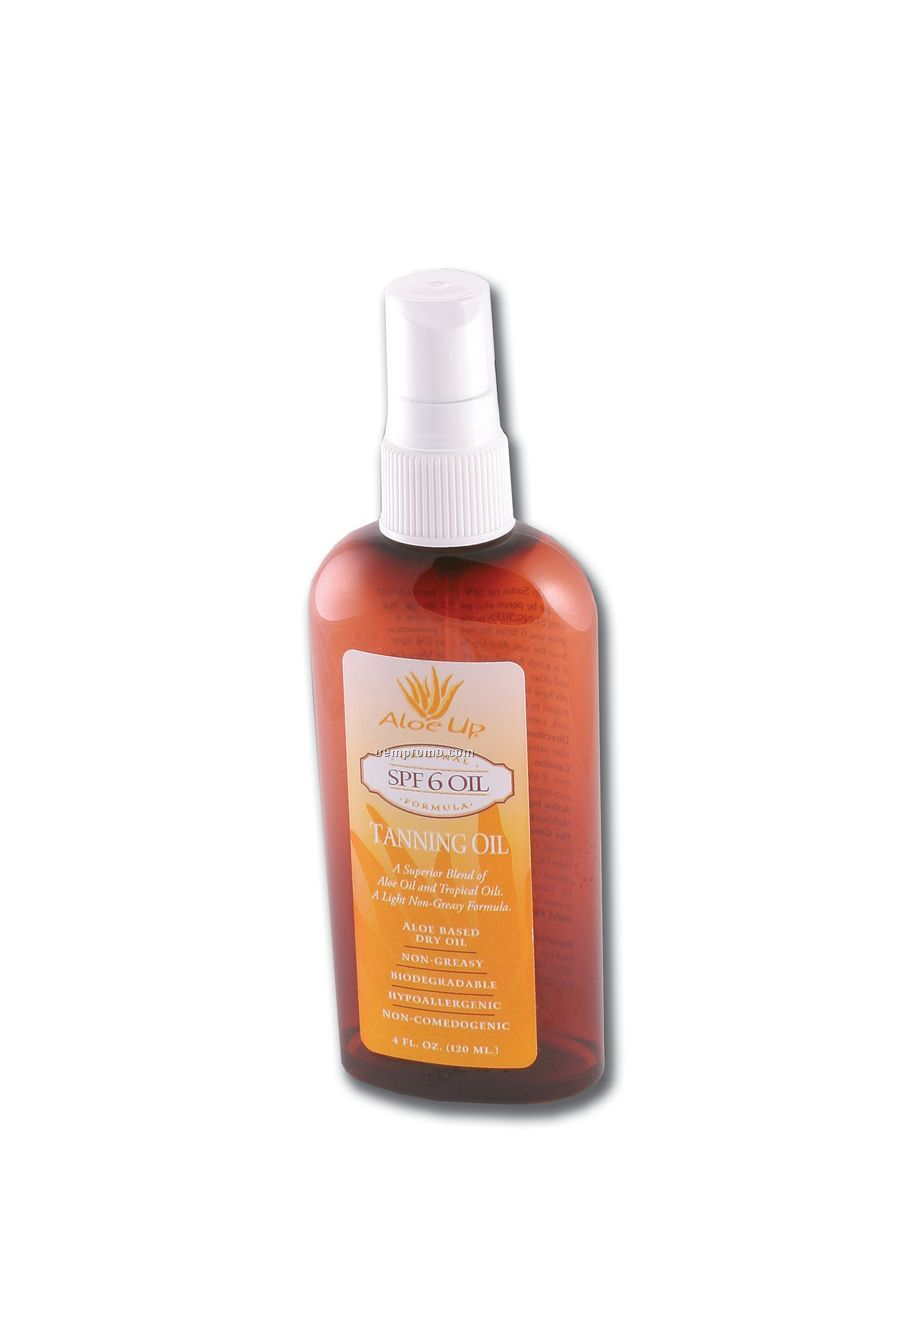 Suntan oil with spf